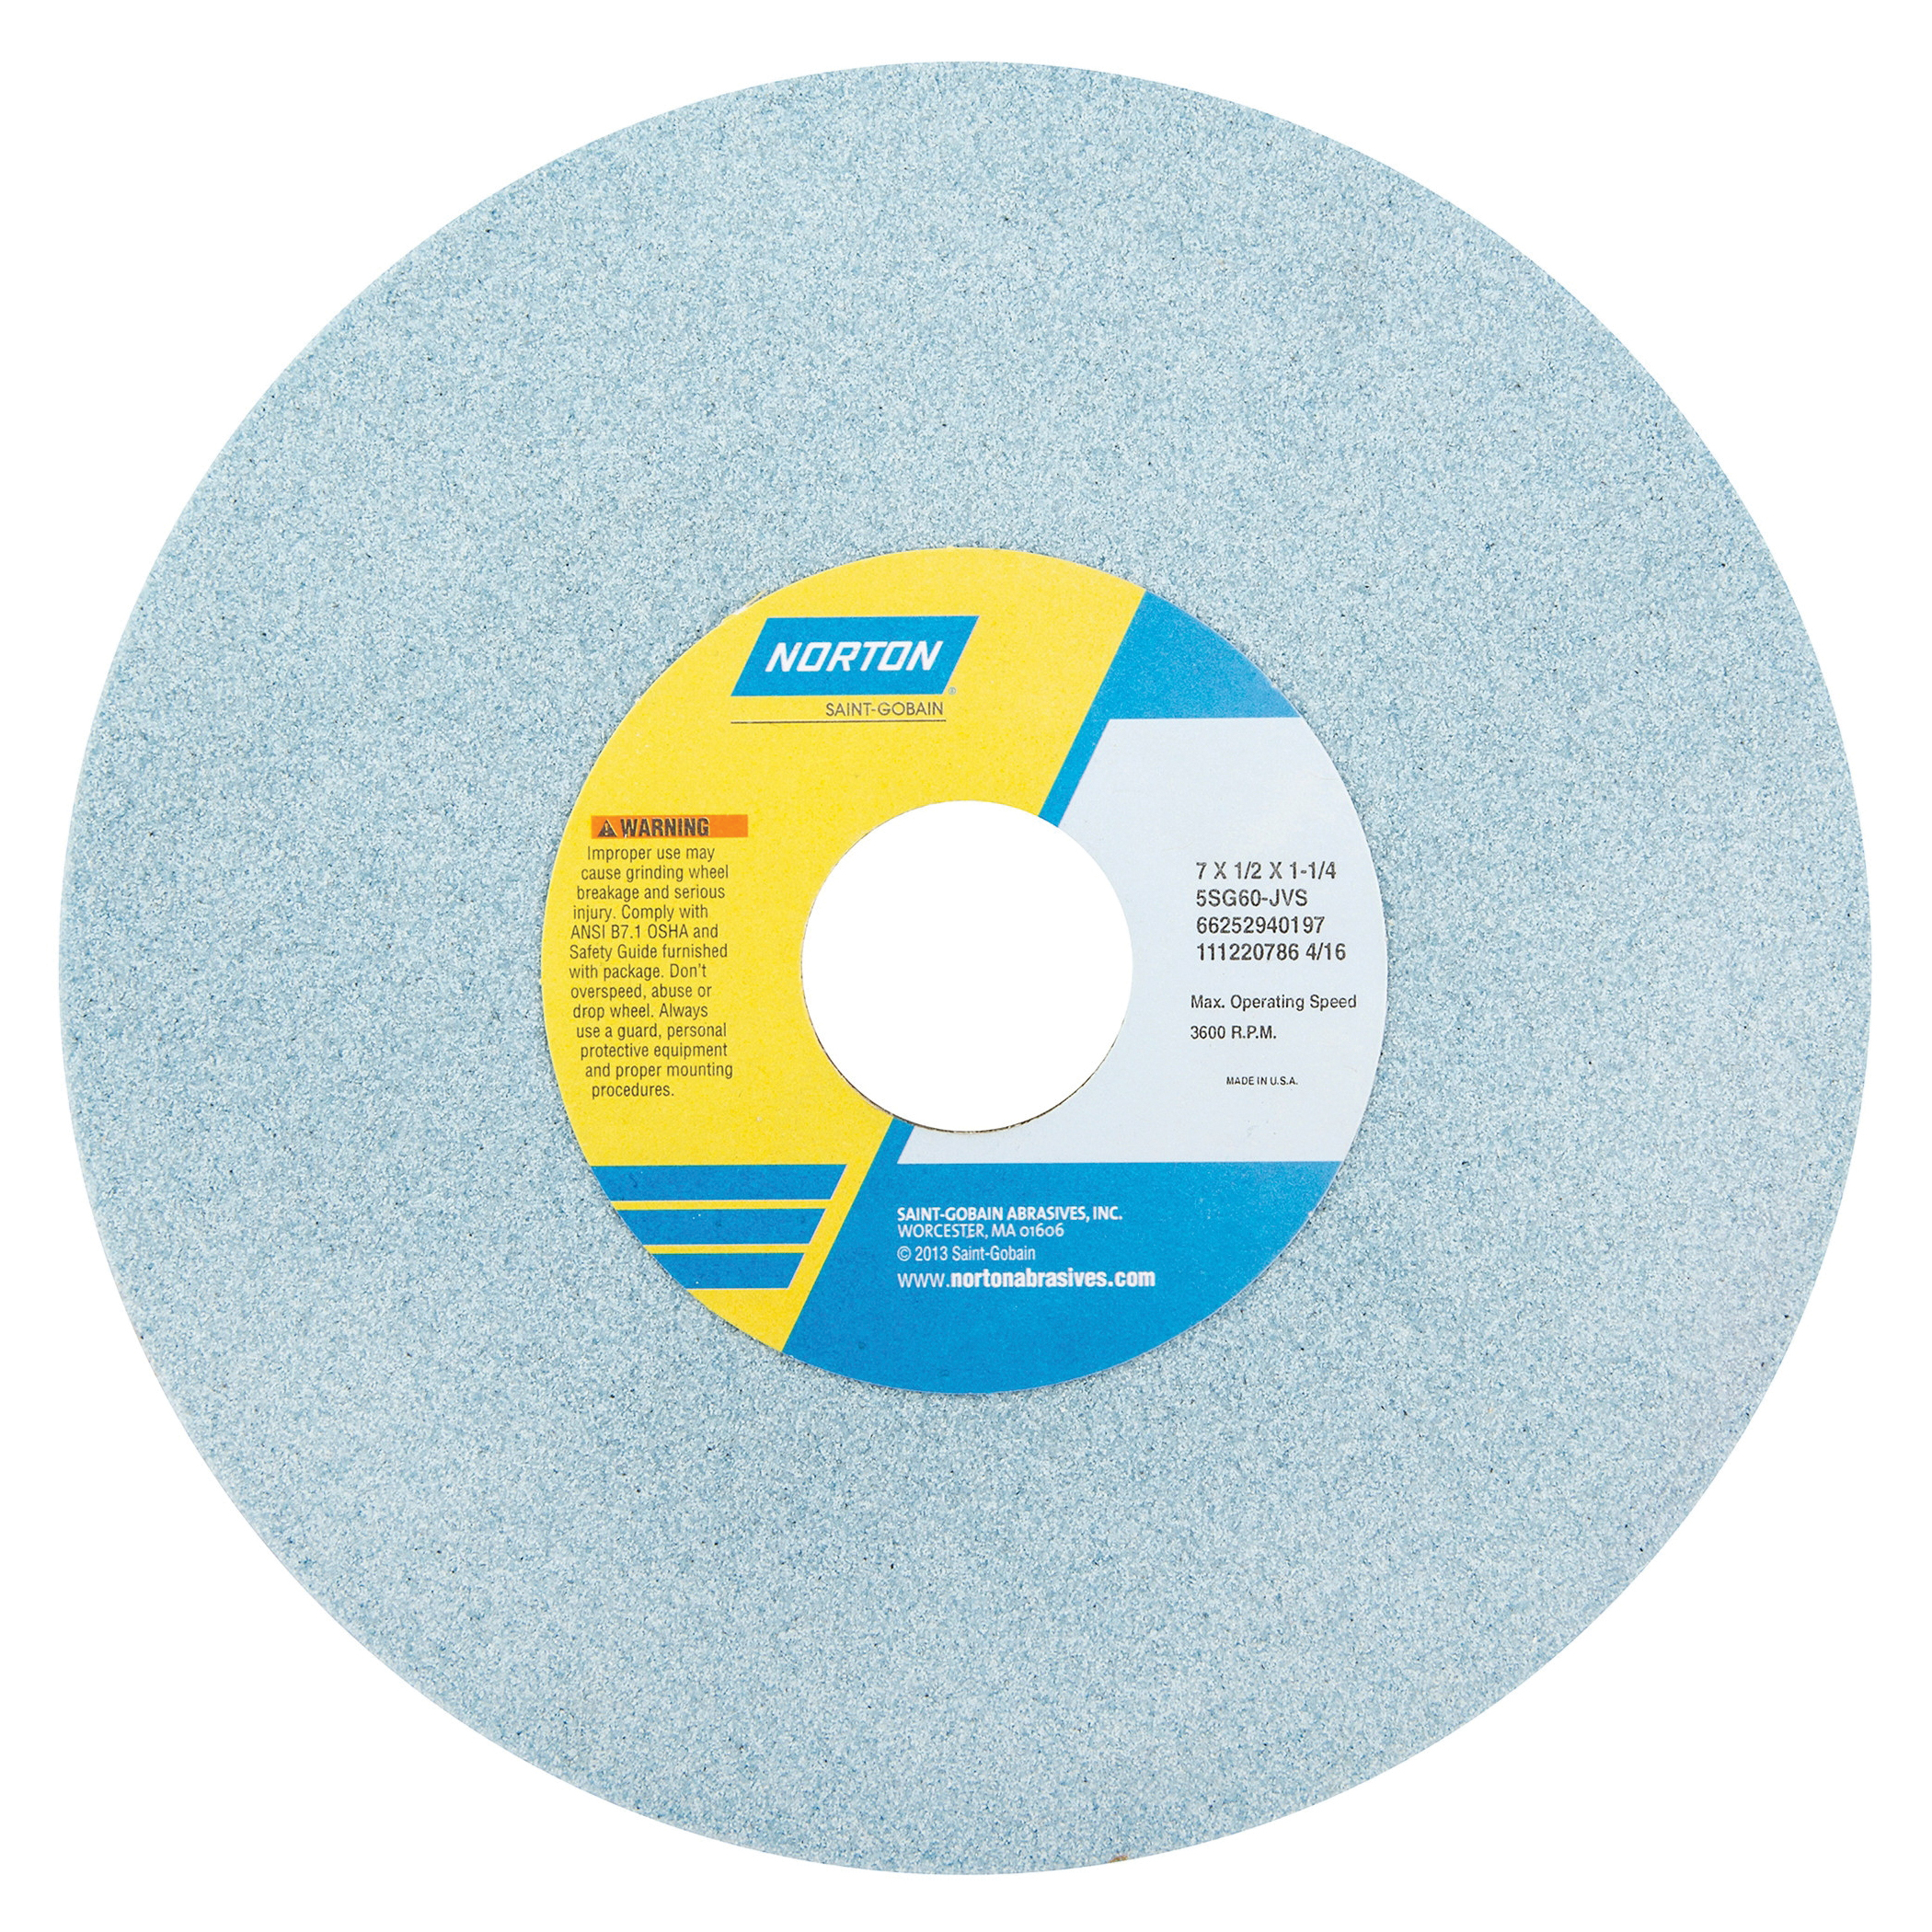 Norton® 66252940204 5SG Straight Toolroom Wheel, 7 in Dia x 1/2 in THK, 1-1/4 in Center Hole, 100 Grit, Ceramic Alumina/Friable Aluminum Oxide Abrasive